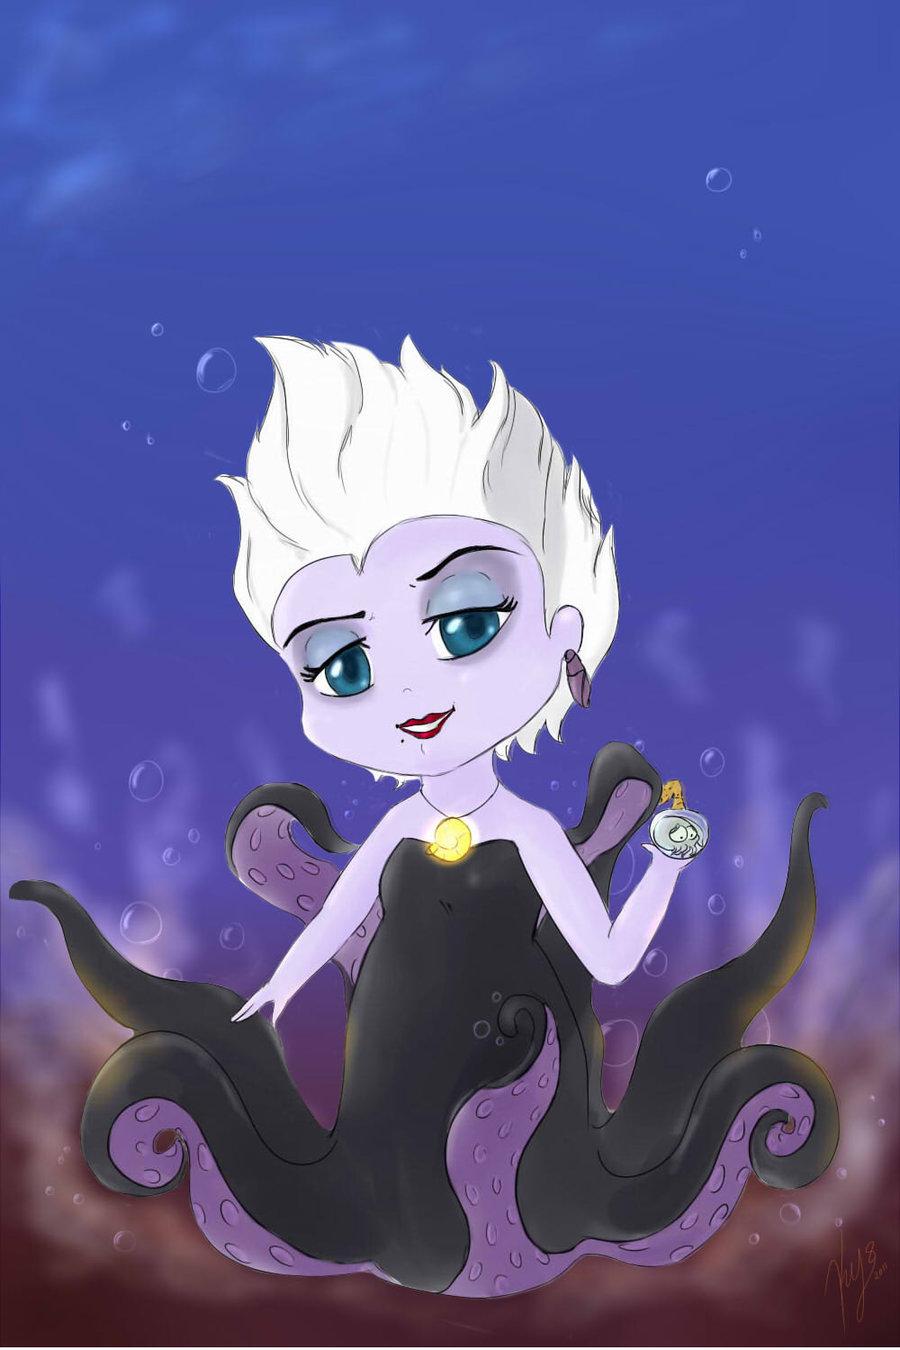 Ursula net worth